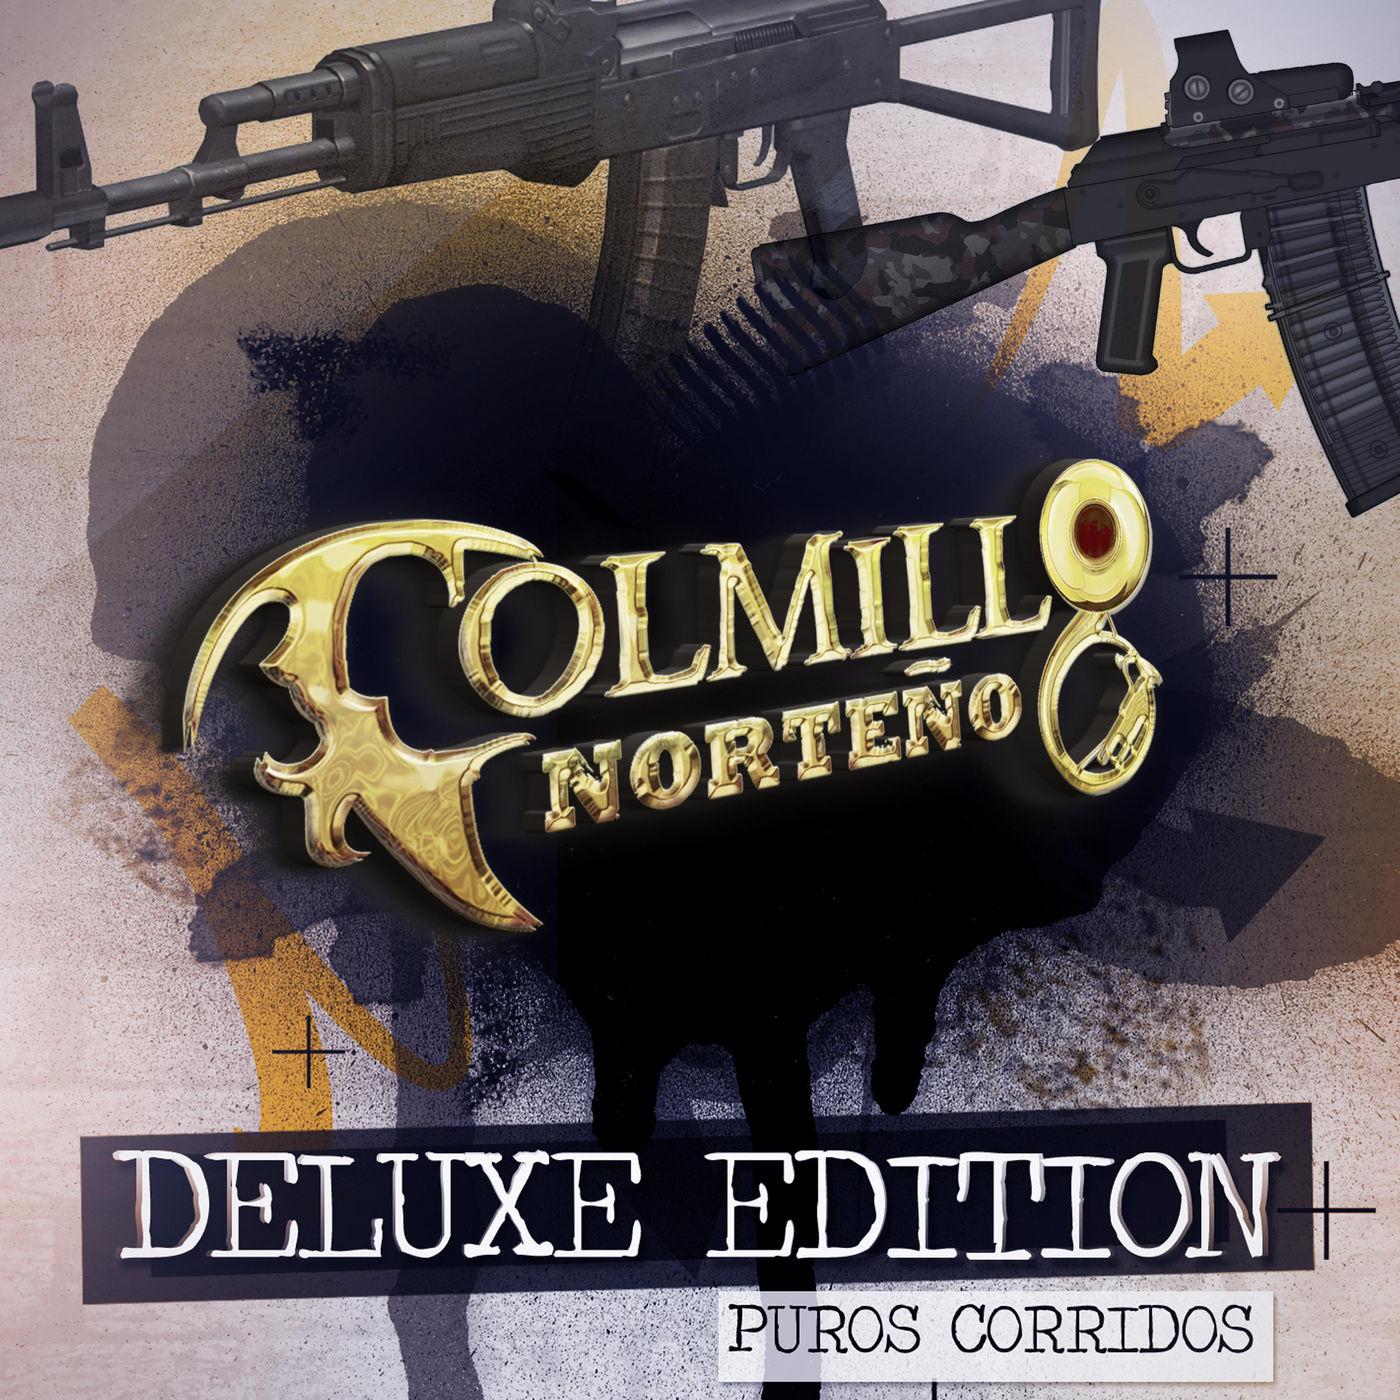 Colmillo Norteño Puros Corridos Deluxe Edition portada